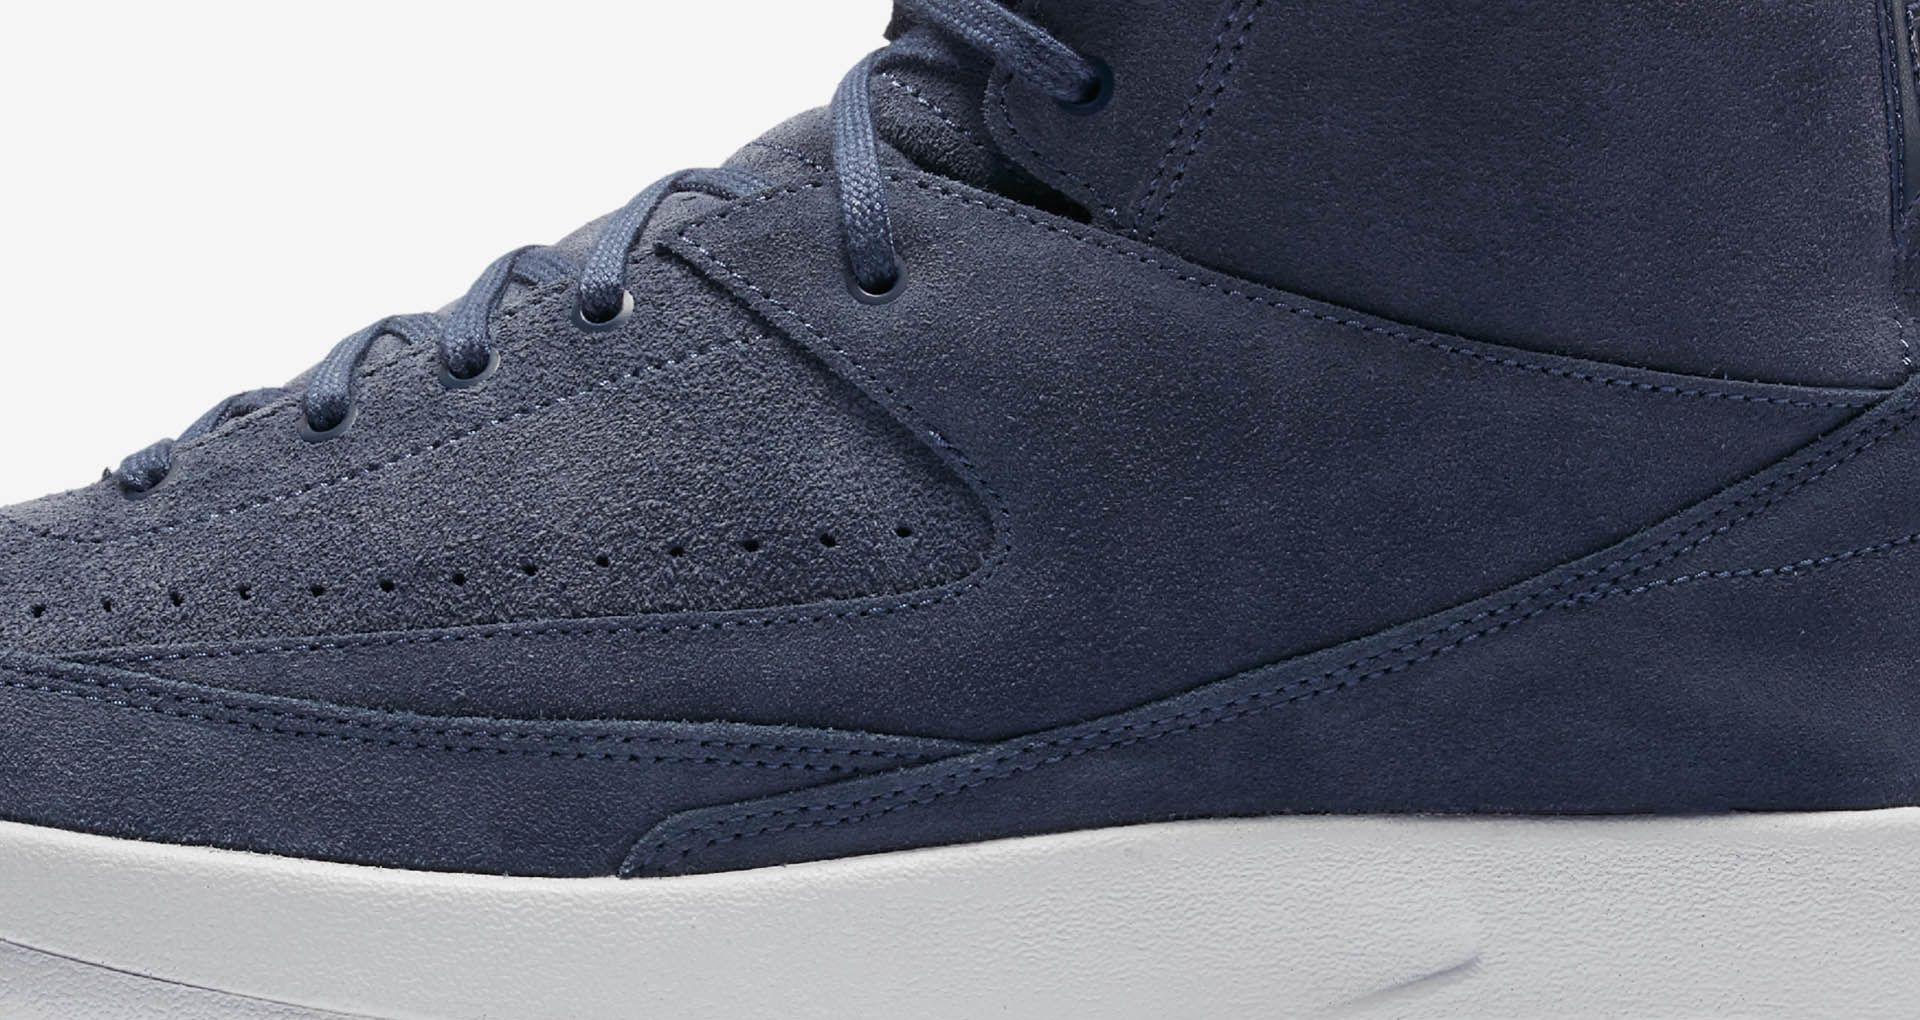 big sale 1a7f8 13766 Air Jordan 2 Retro Decon  Thunder Blue  Release Date